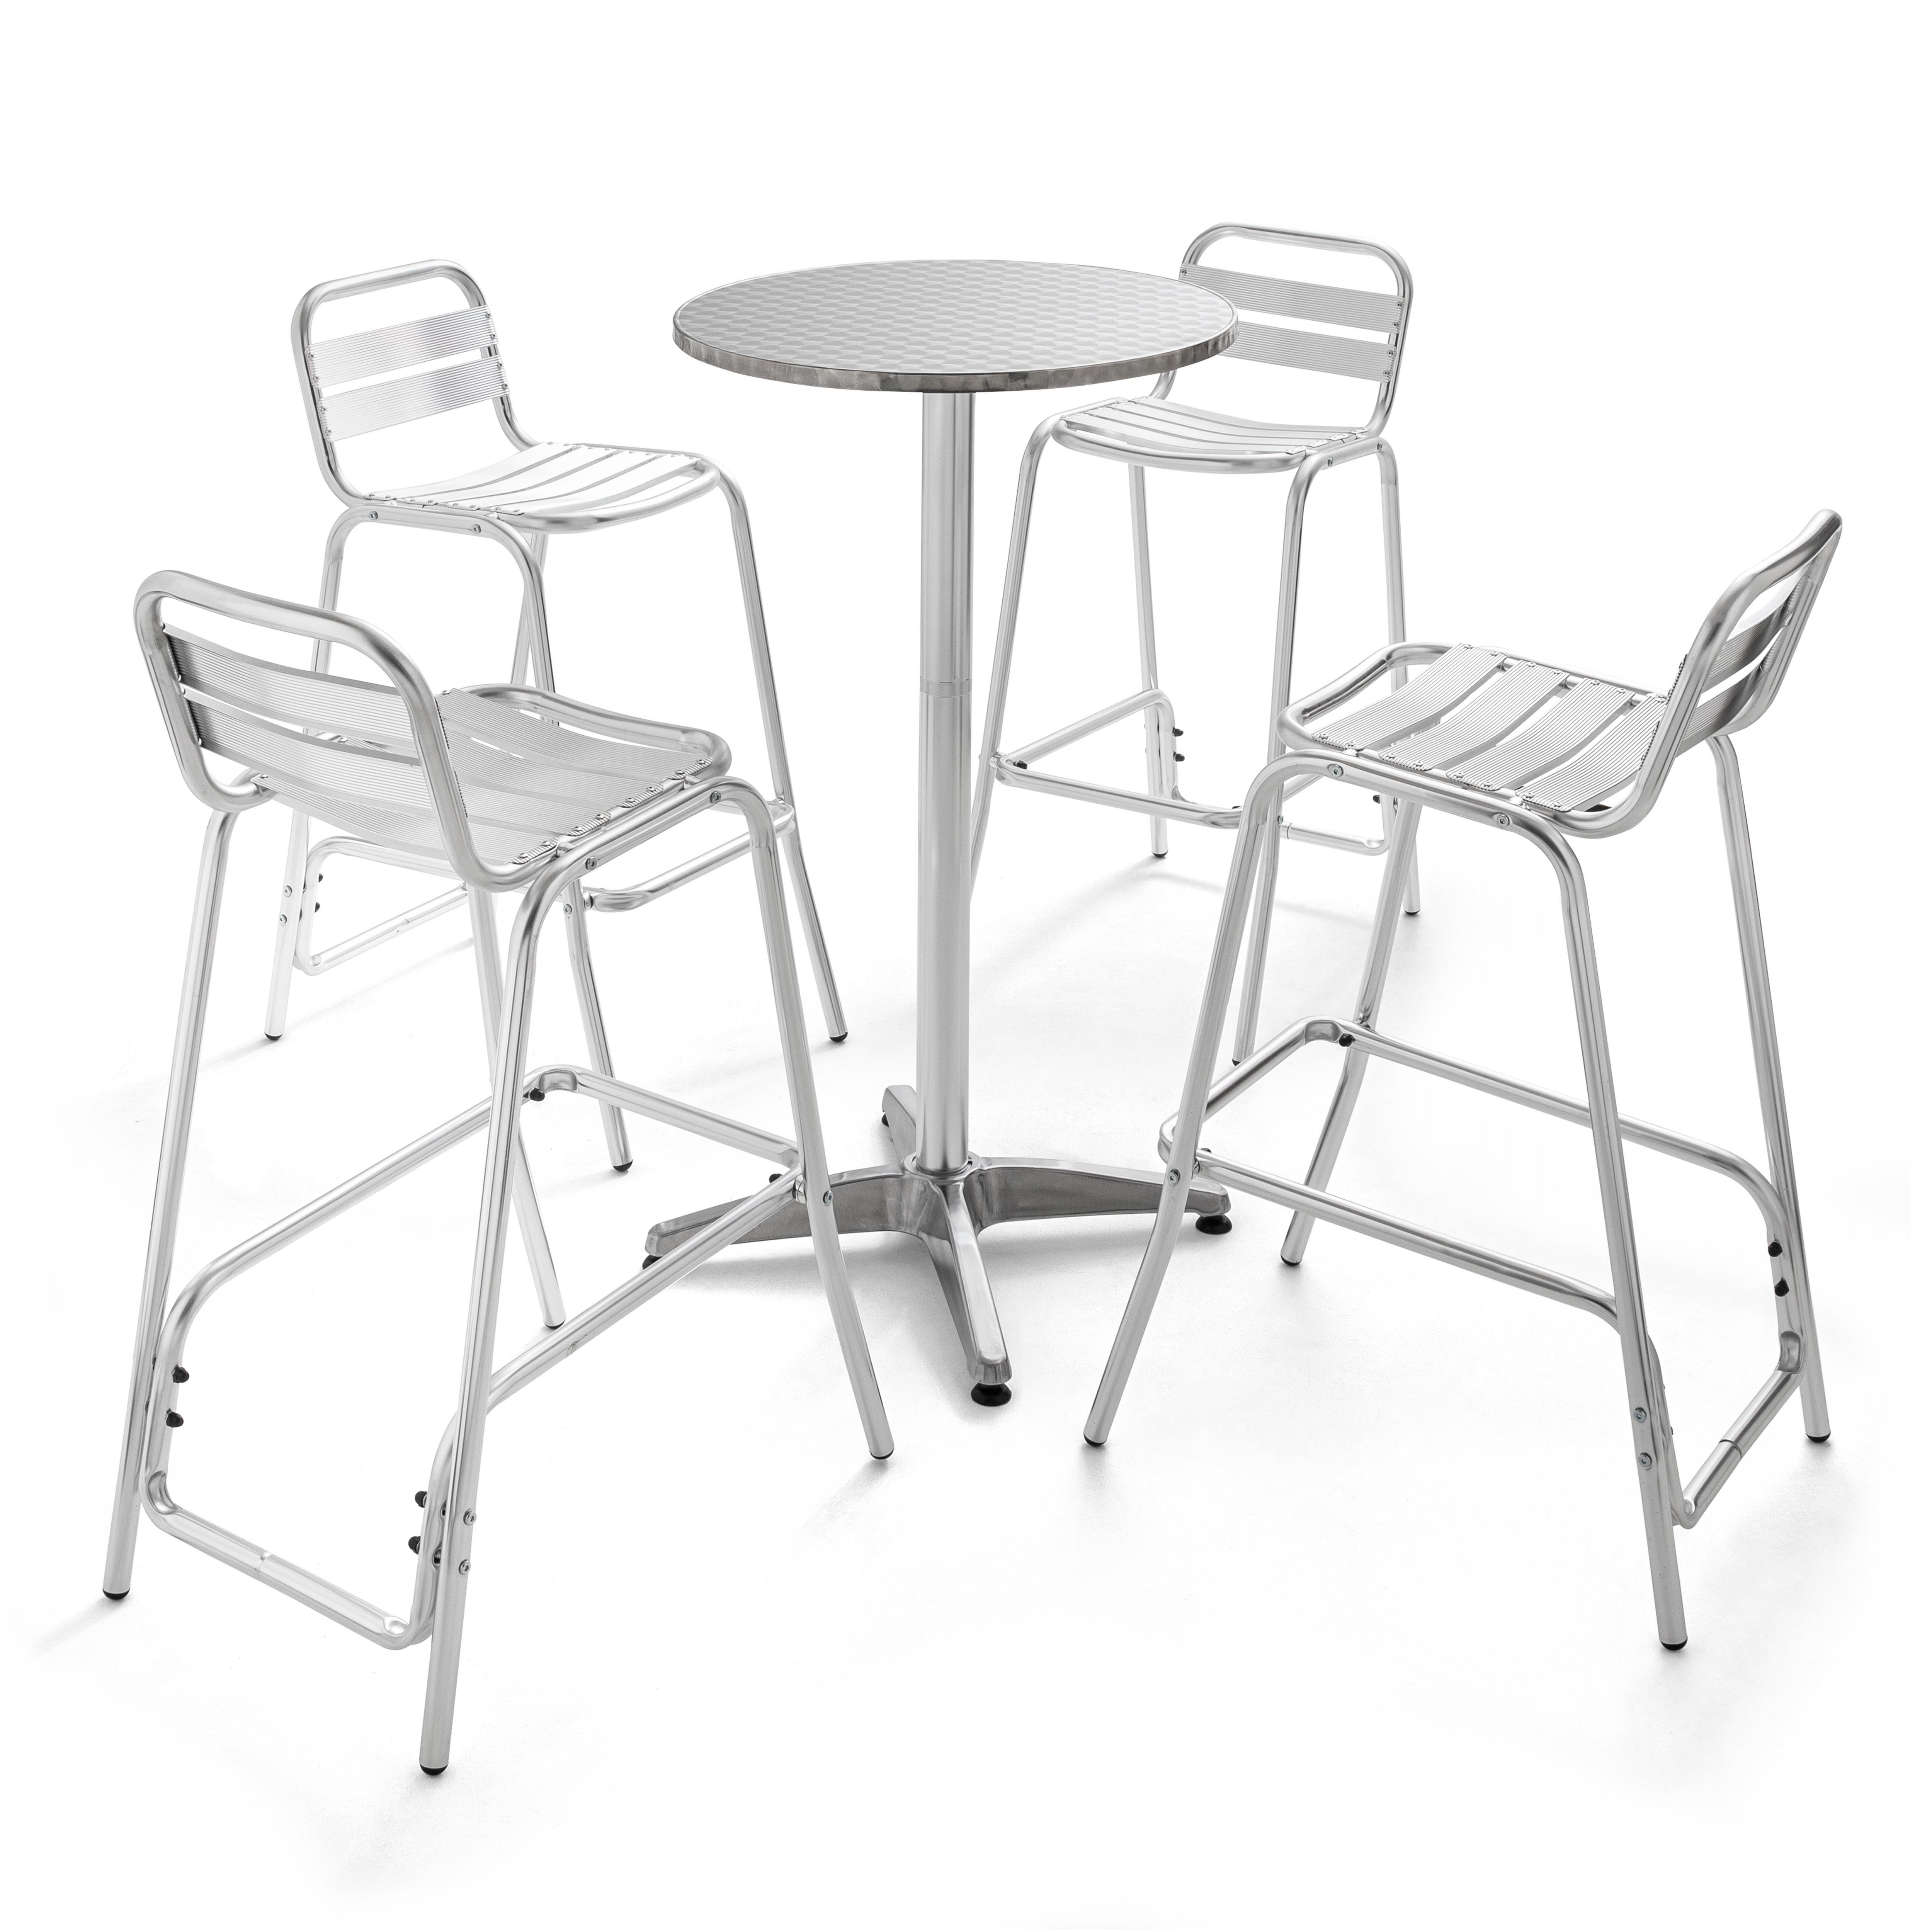 Table de jardin haute en aluminium et 4 tabourets